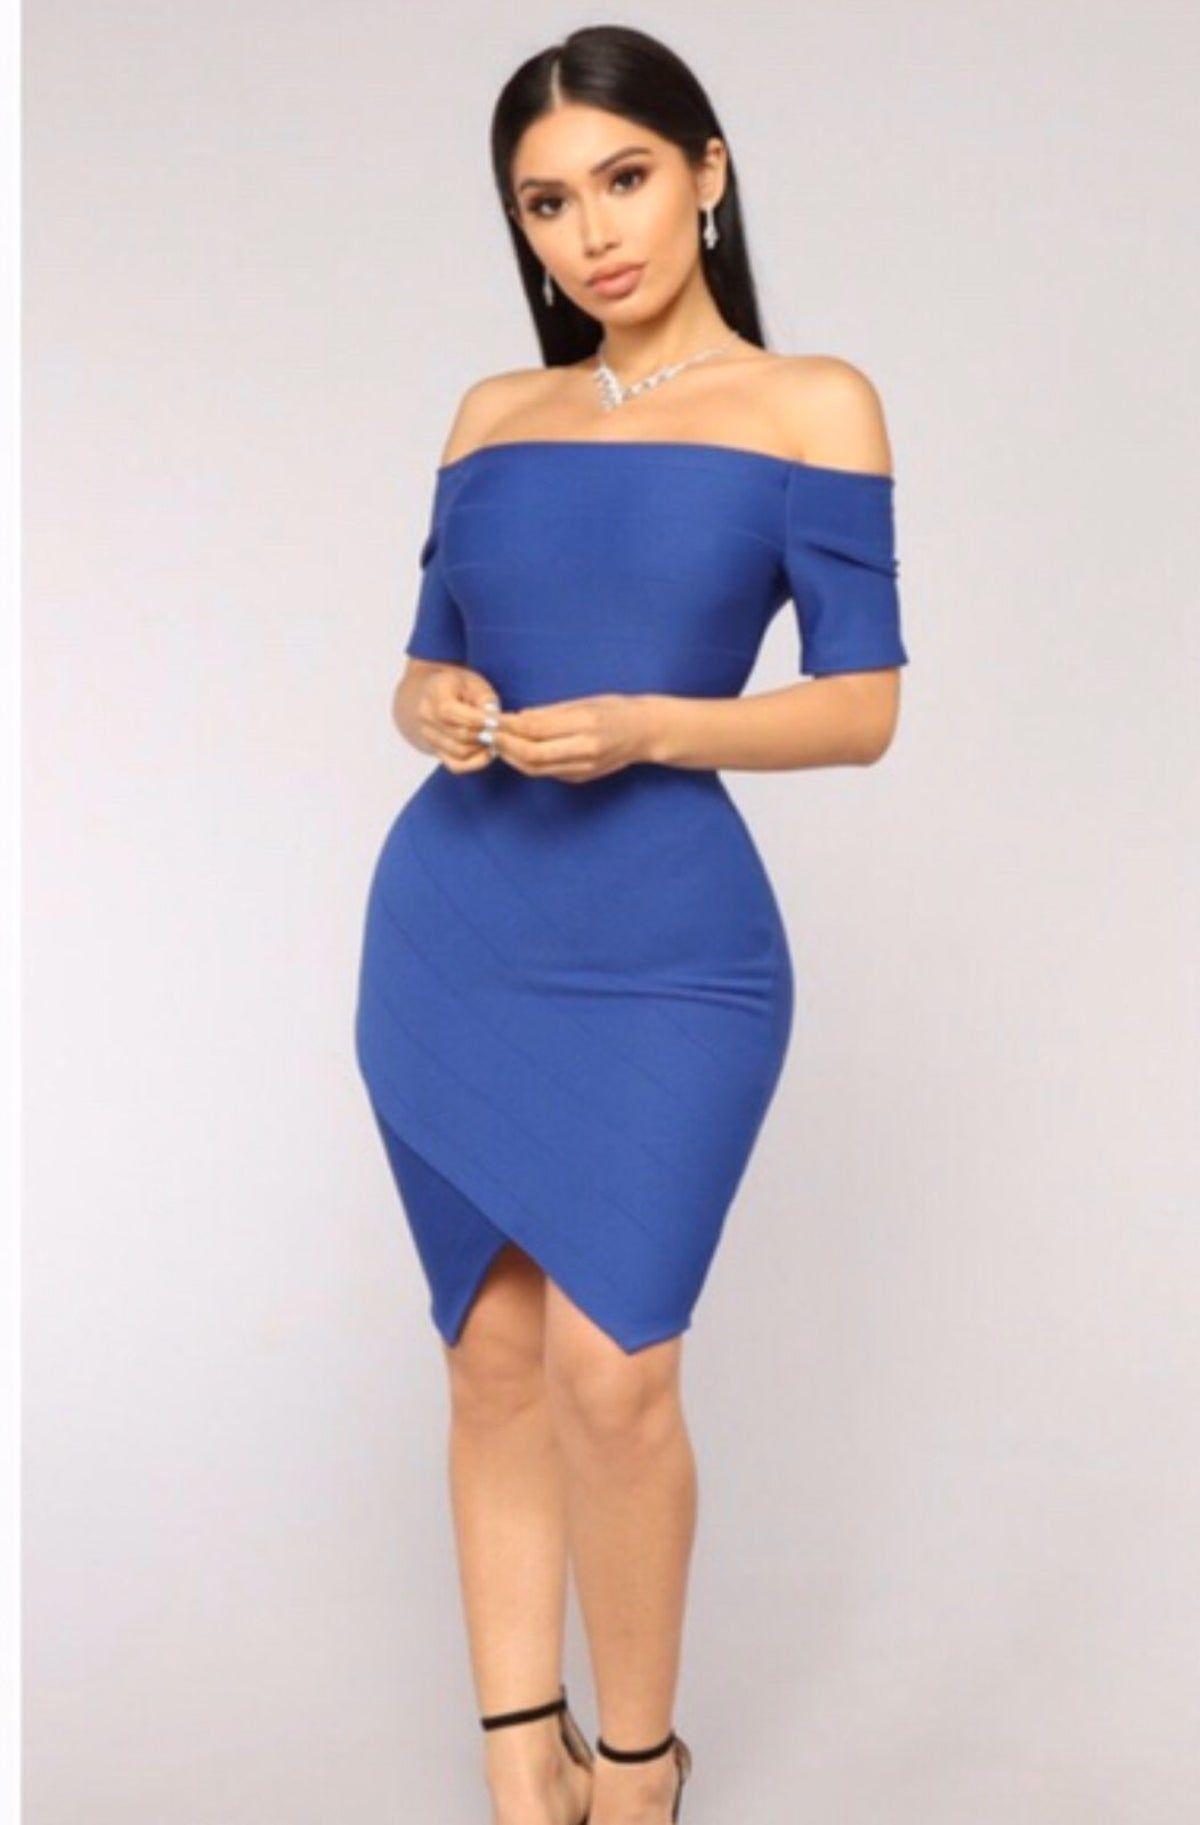 Get Fashion Nova Dresses Long Pictures - Fashion Stylish